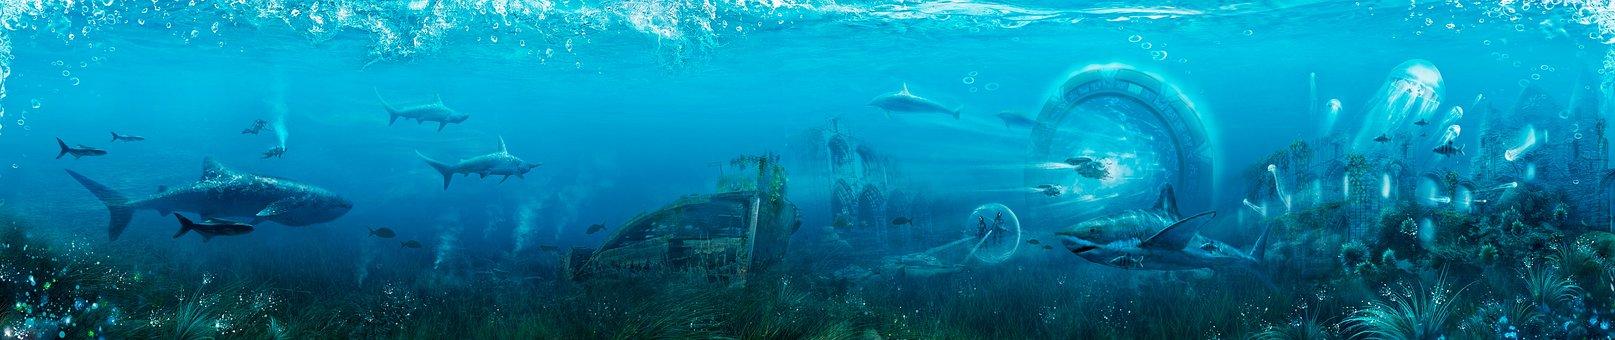 Sharks, Fiction, Water, Deep, Underwater, Blue, Fish